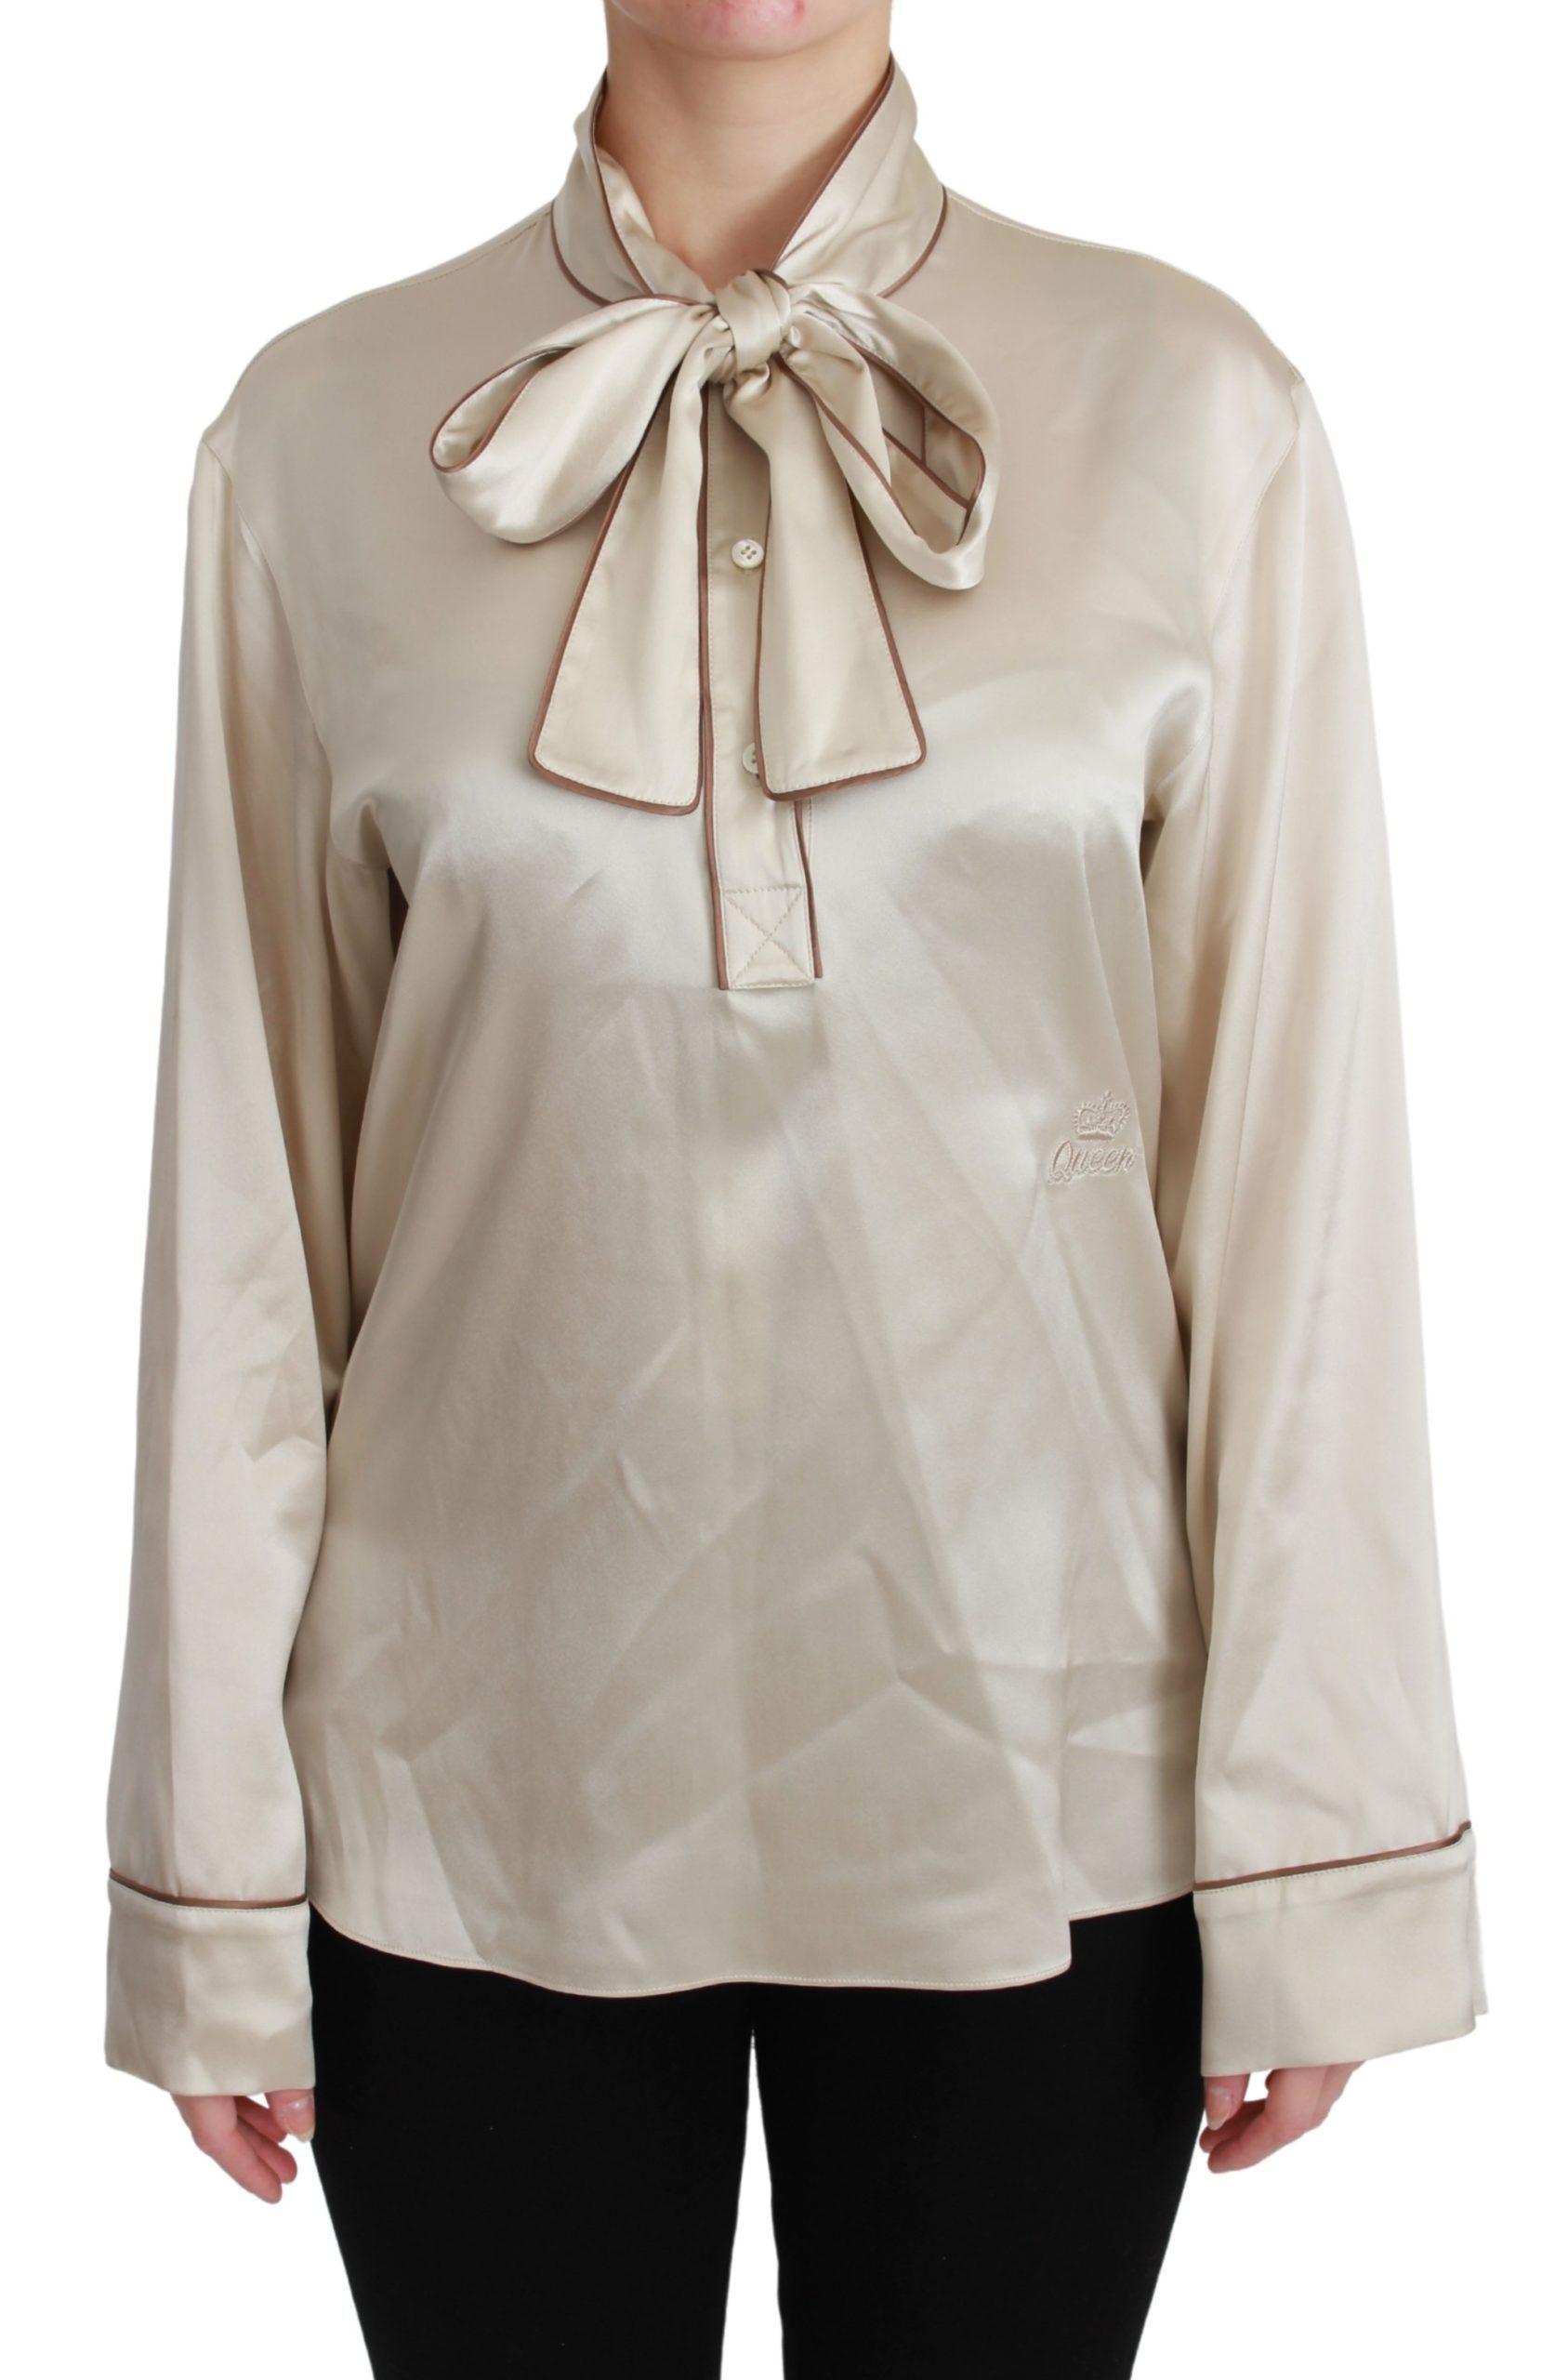 Dolce & Gabbana Women's Sleeve Queen Silk Satin Top Beige TSH4657 - IT40 S